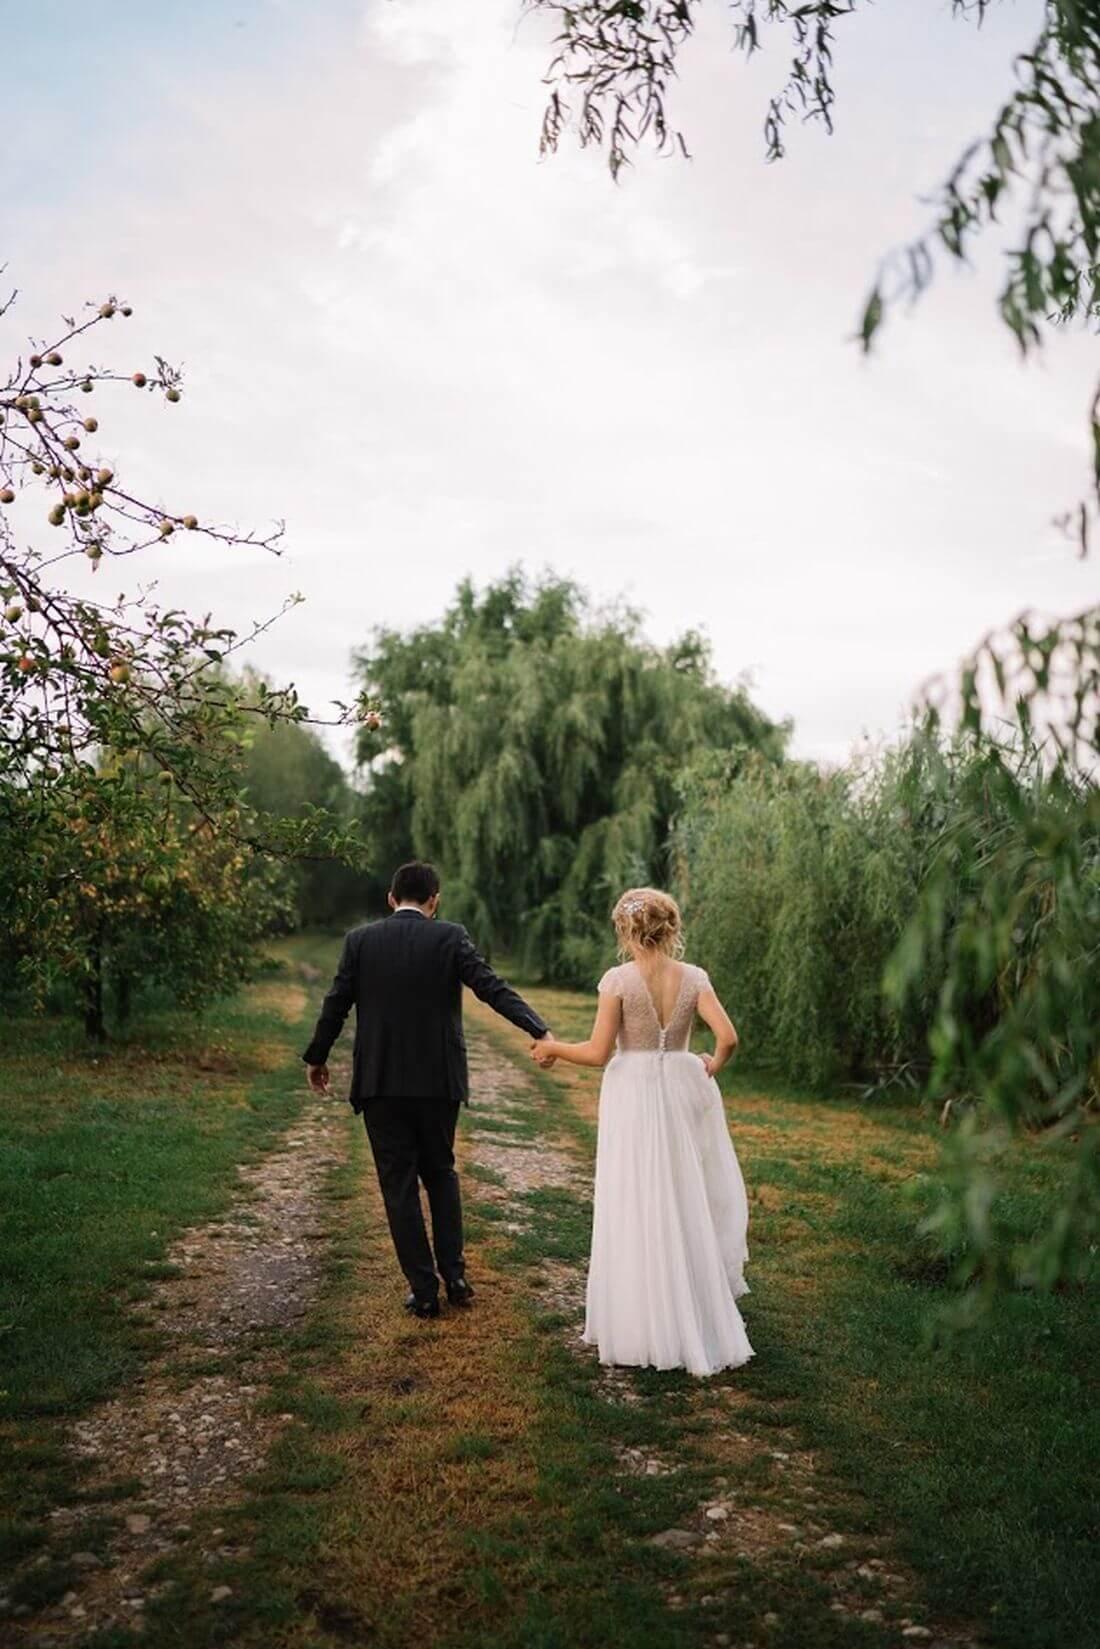 Nunta cu artificii, lavanda si muzica – Adelina si Ionut-IDO-Weddings-nuntiinaerliber (27)